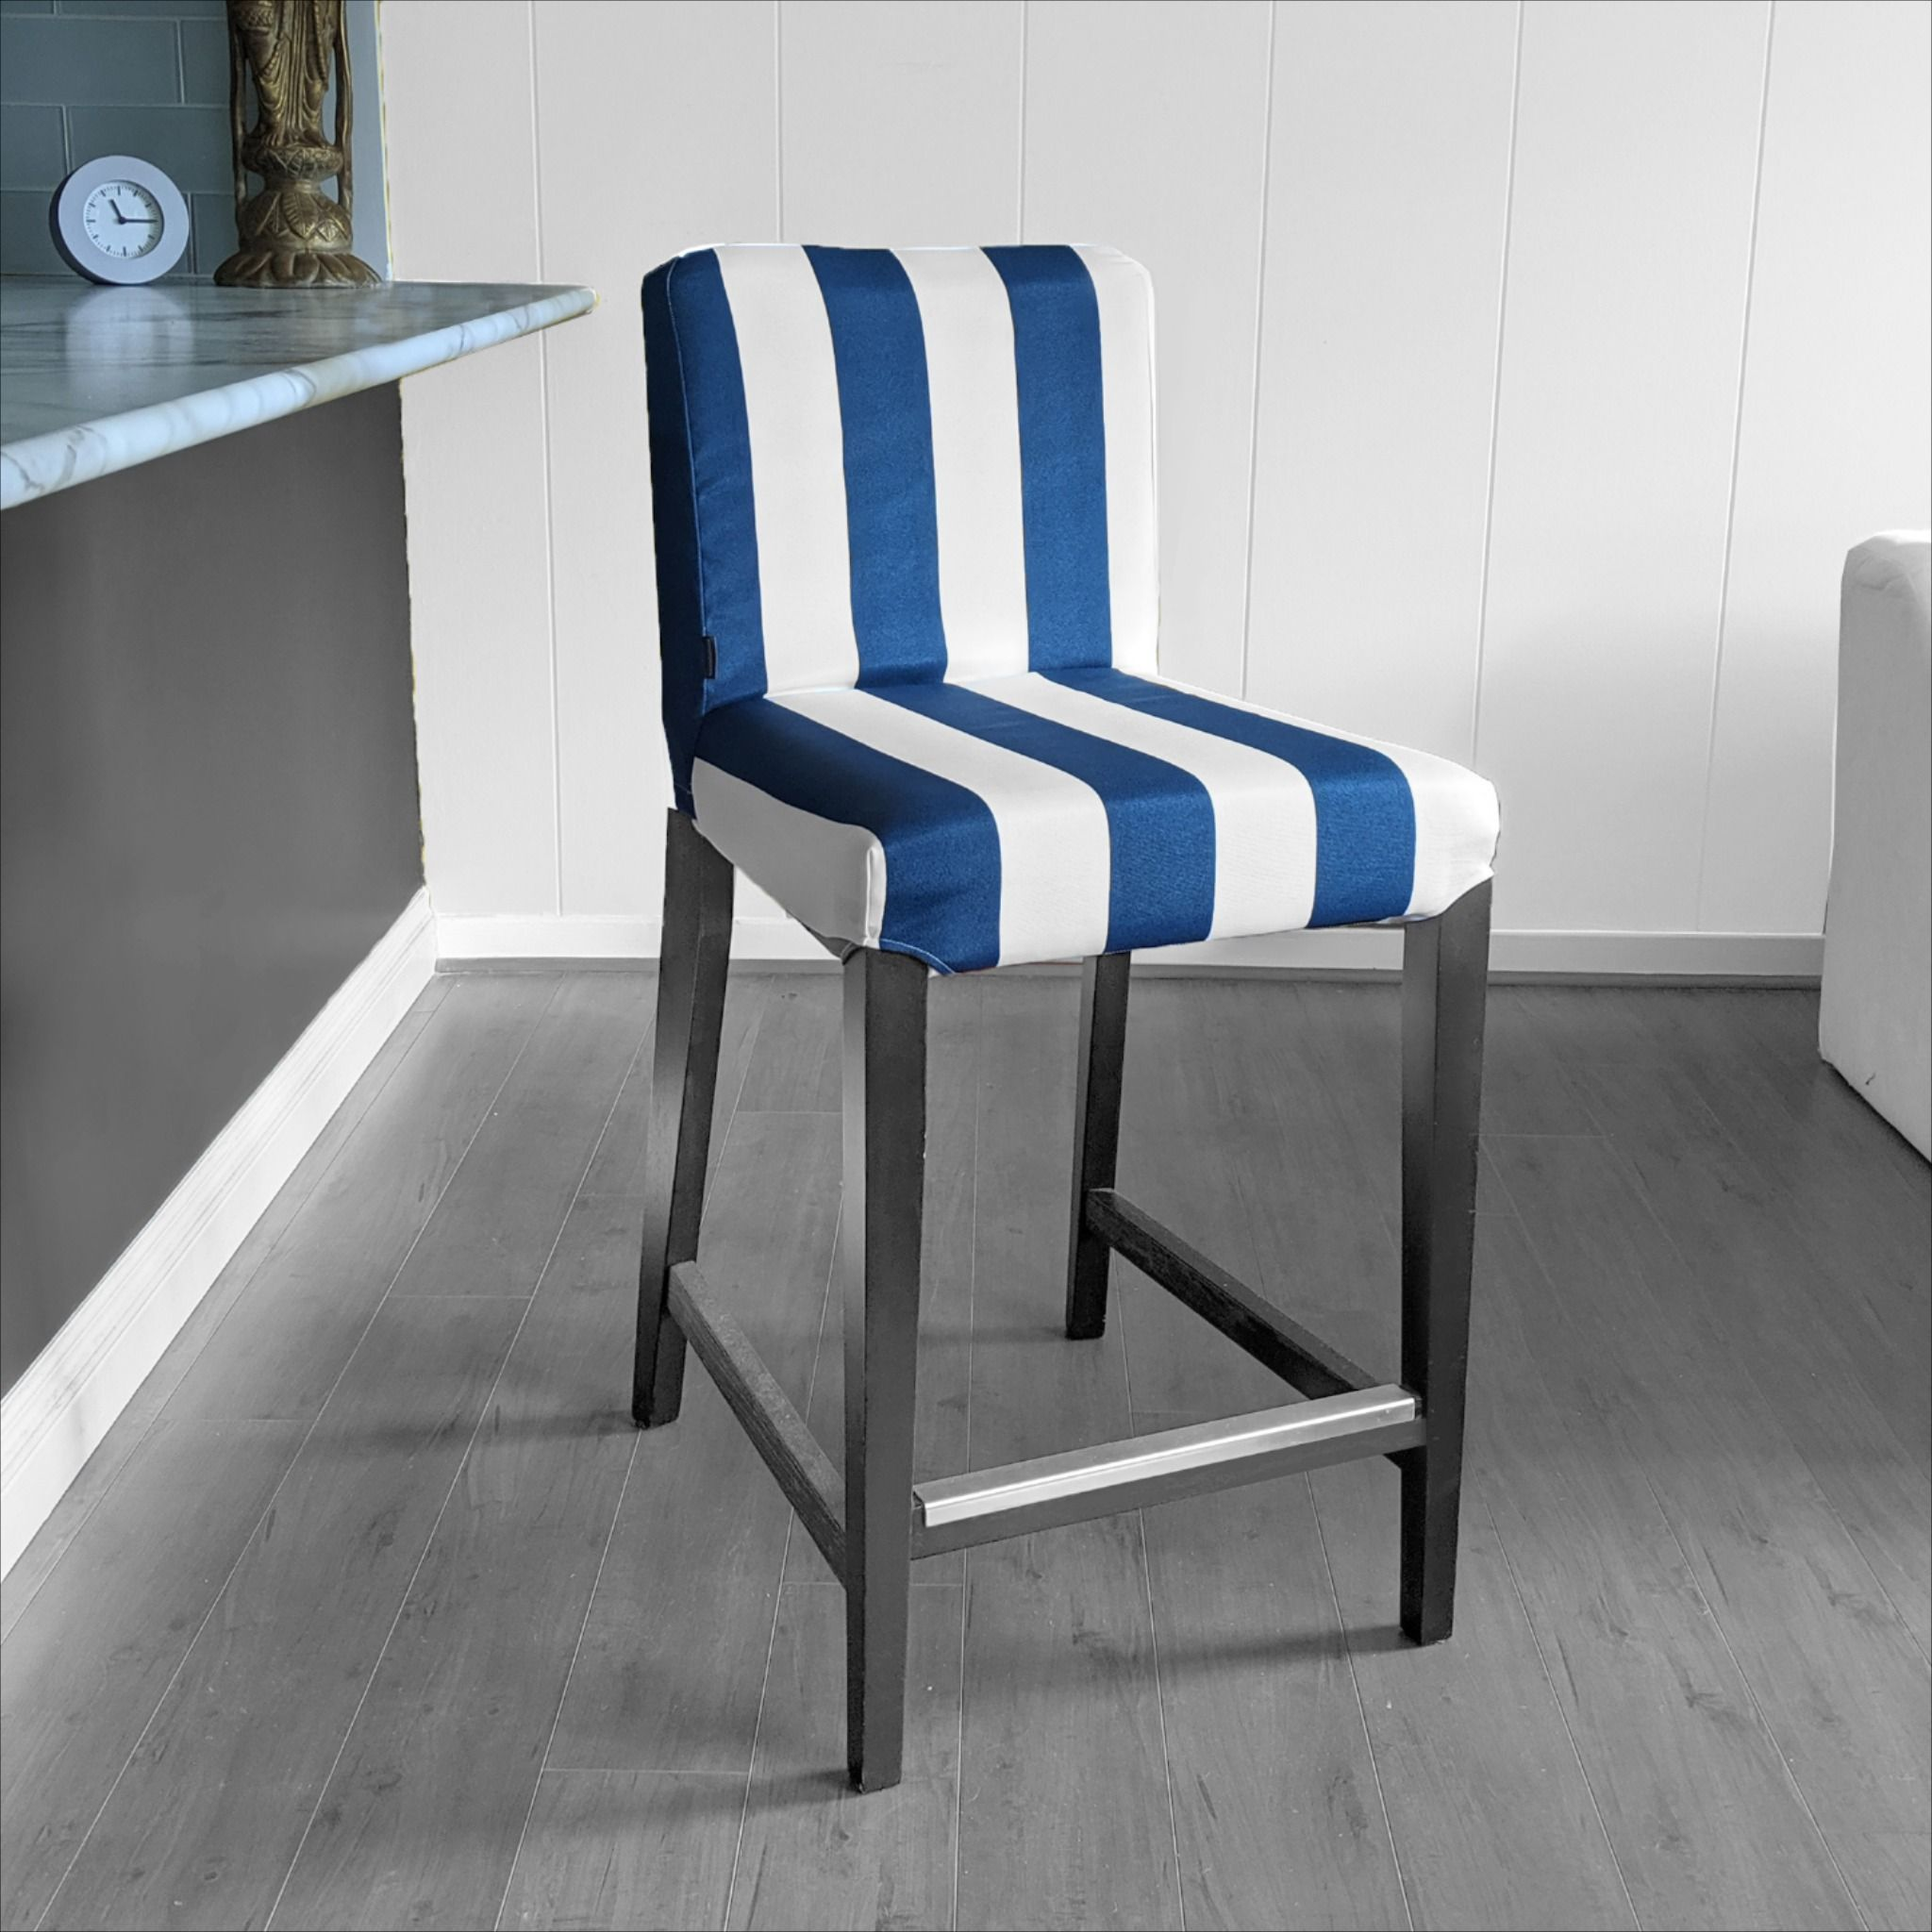 Ikea Henriksdal Bar Stool Chair Cover Navy Blue Cabana Stripe